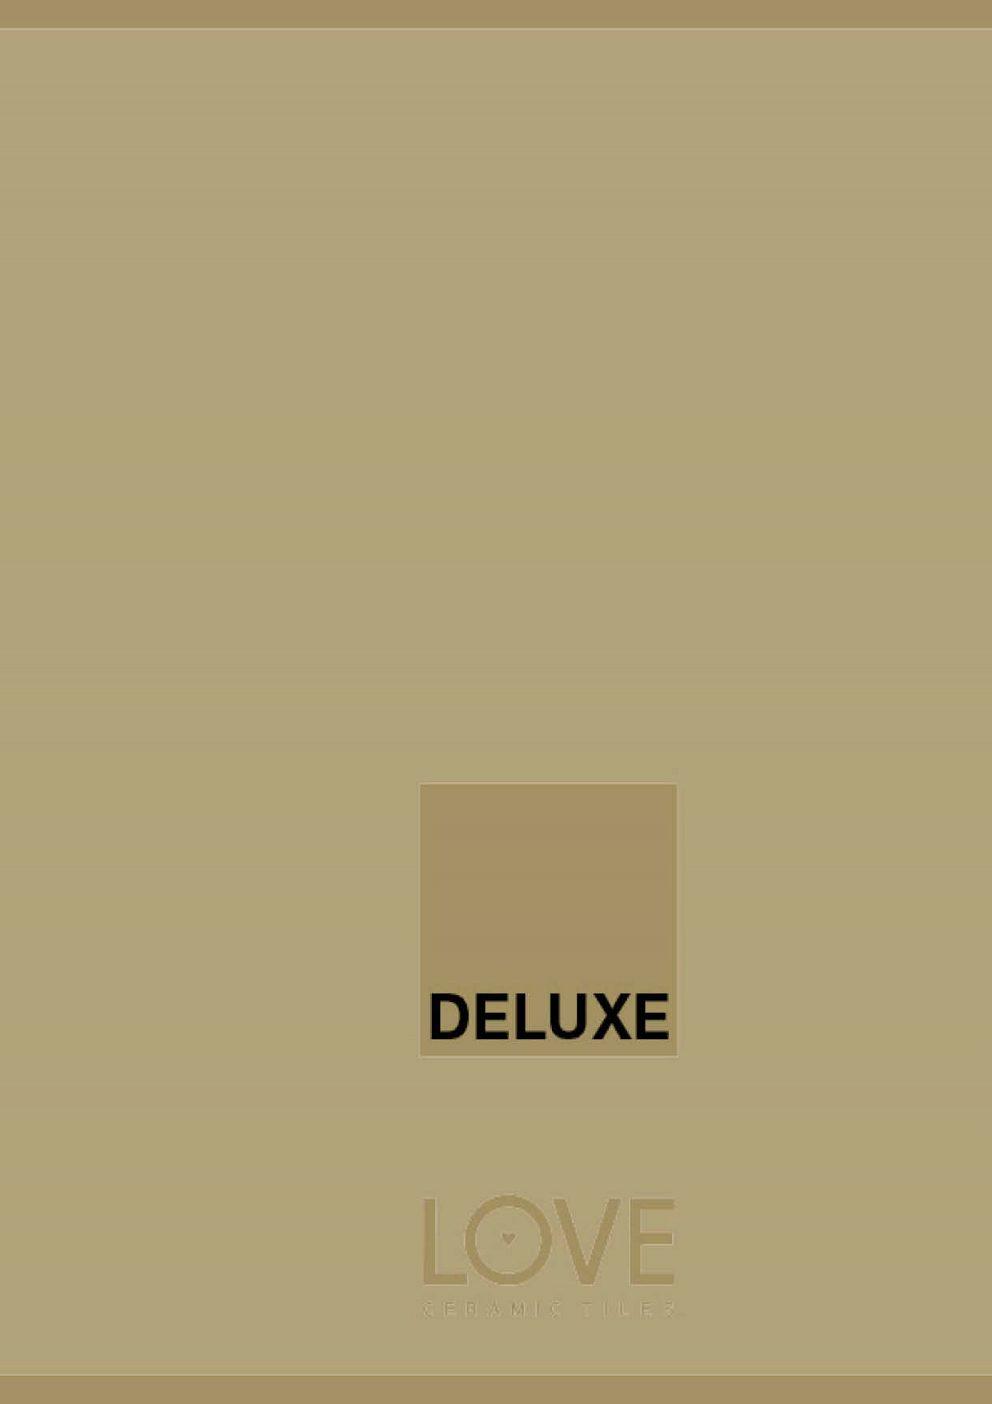 Love - Delux